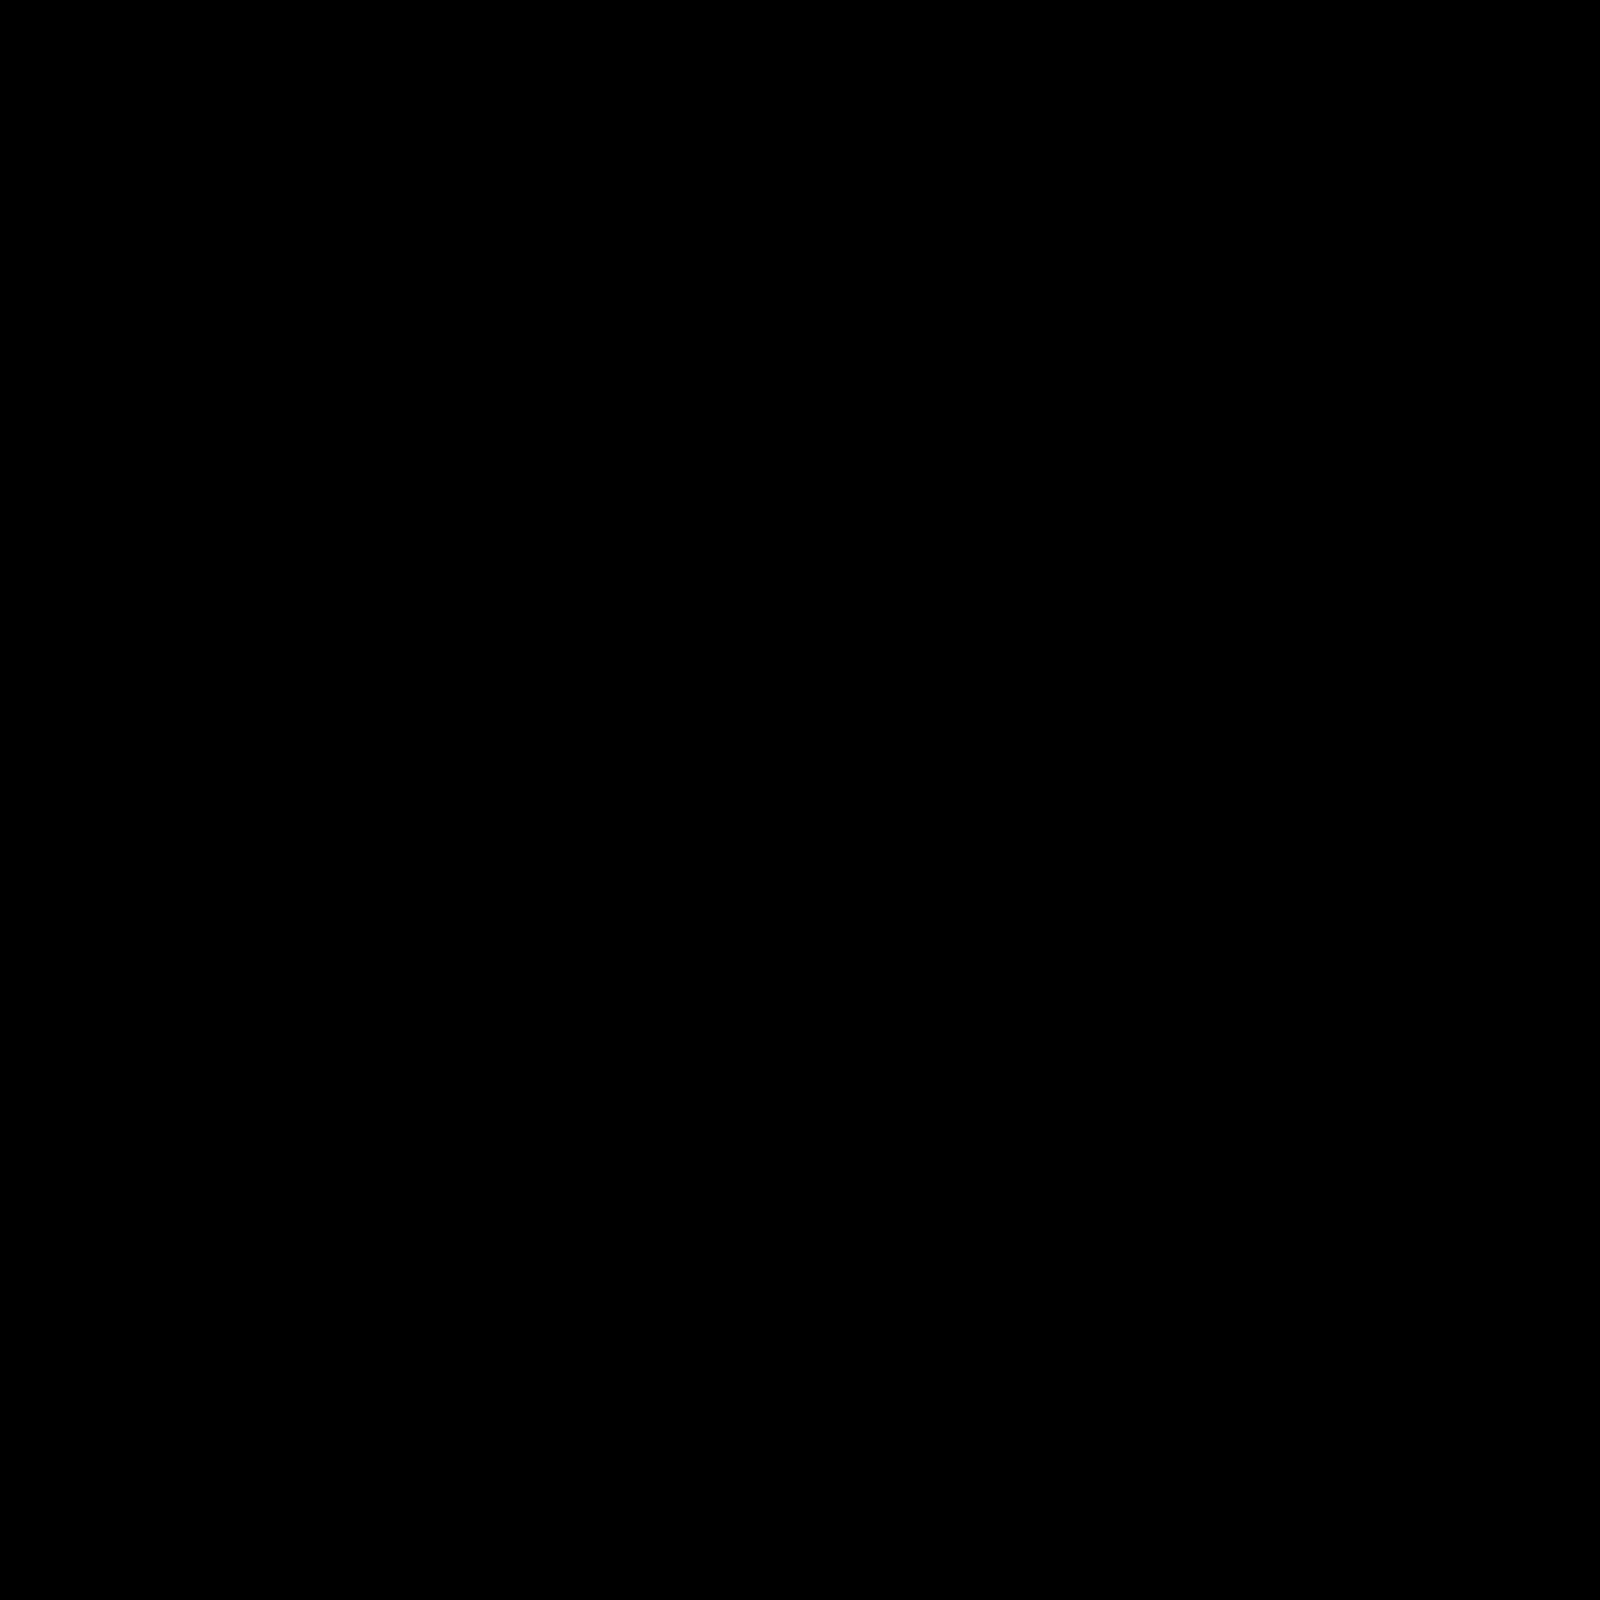 Pokeball clipart simplistic. Konoha symbol kertoon com